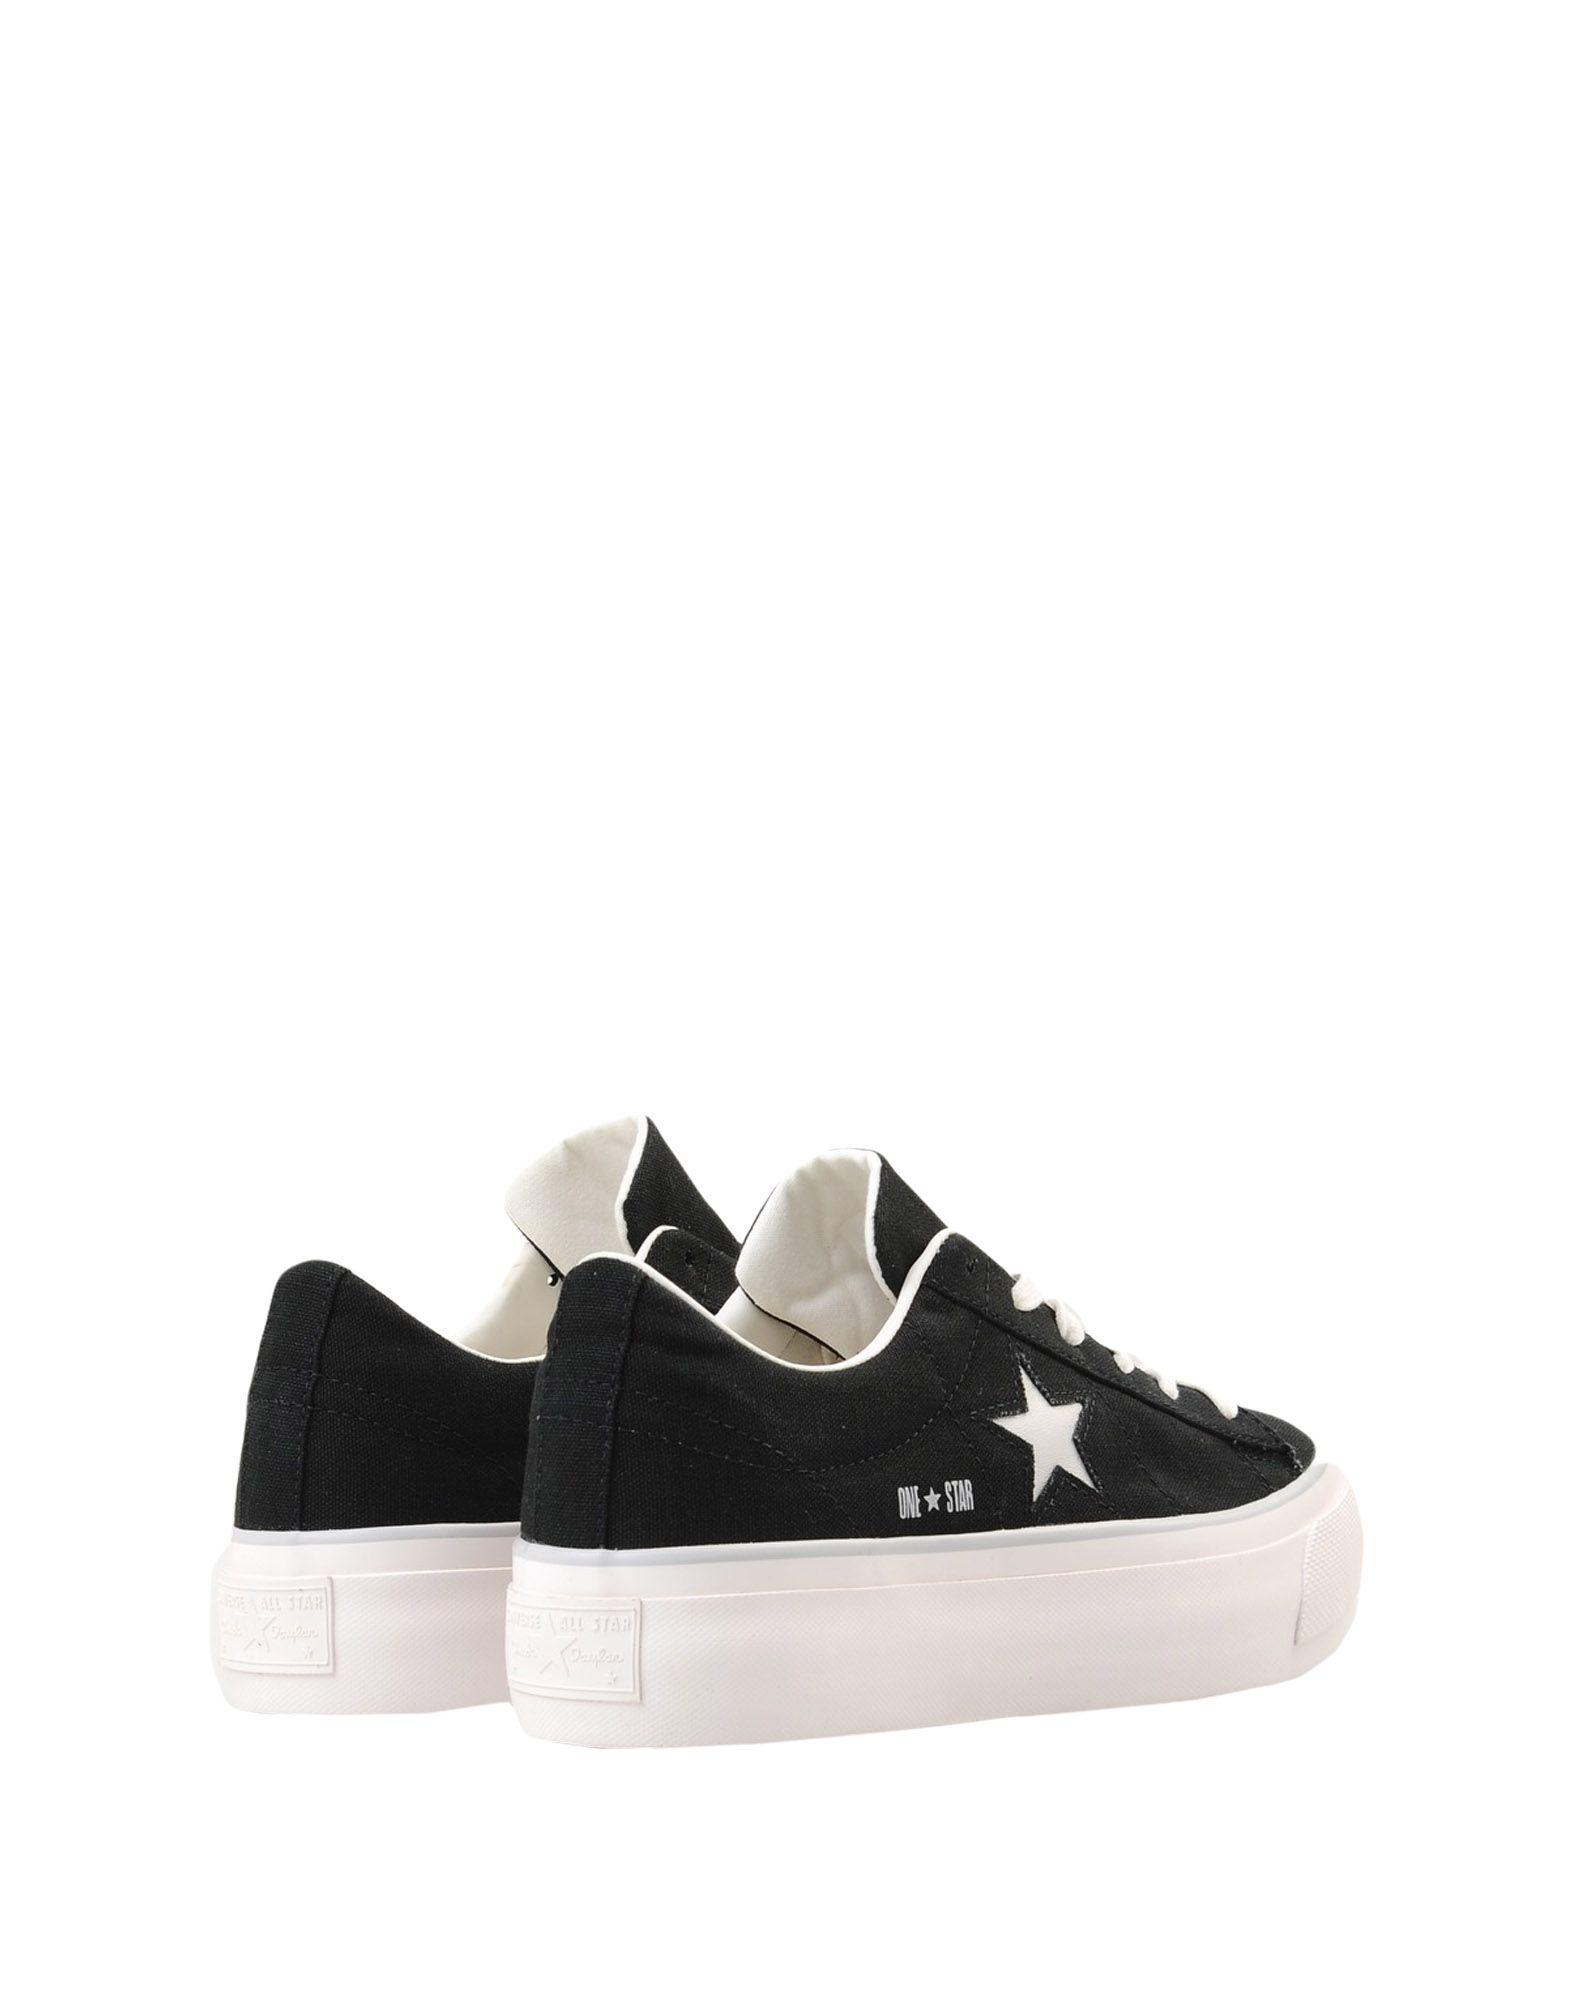 Converse All Star One One One Star Platform Ox Glitter Canvas  11461363DR Gute Qualität beliebte Schuhe 557d1c